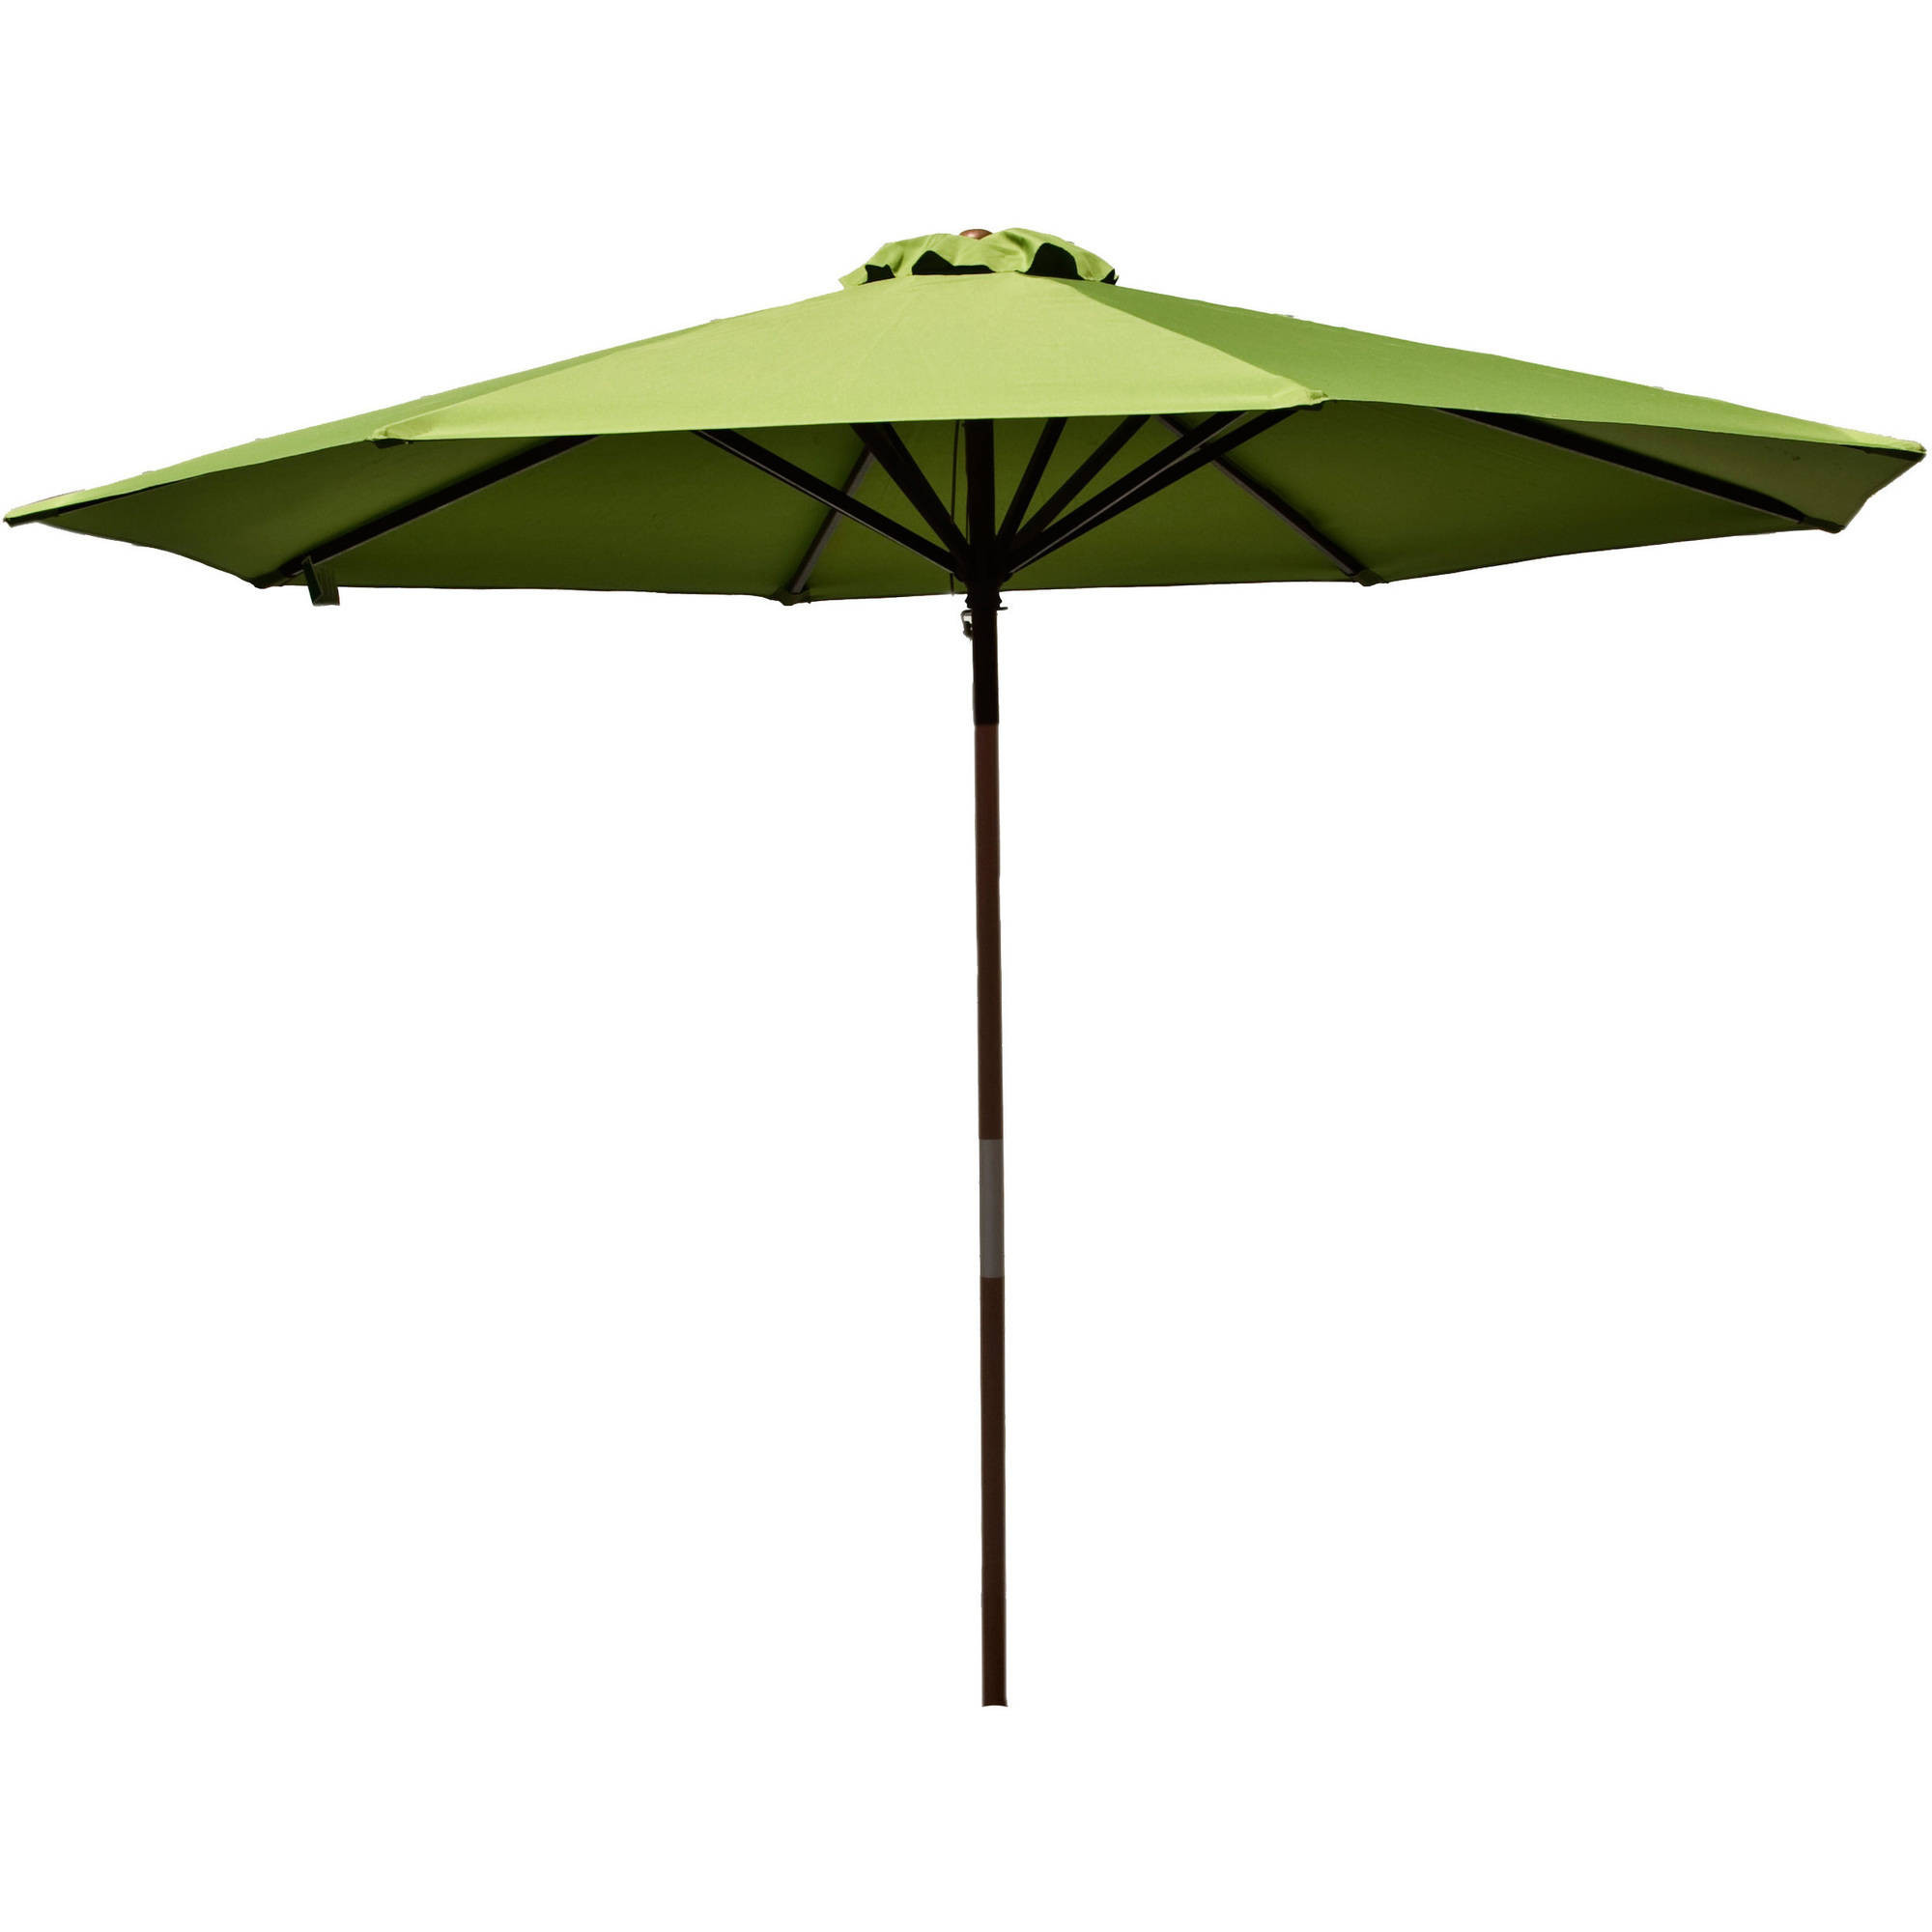 Best ideas about Patio Umbrella Walmart . Save or Pin Beach Umbrellas Walmart Now.